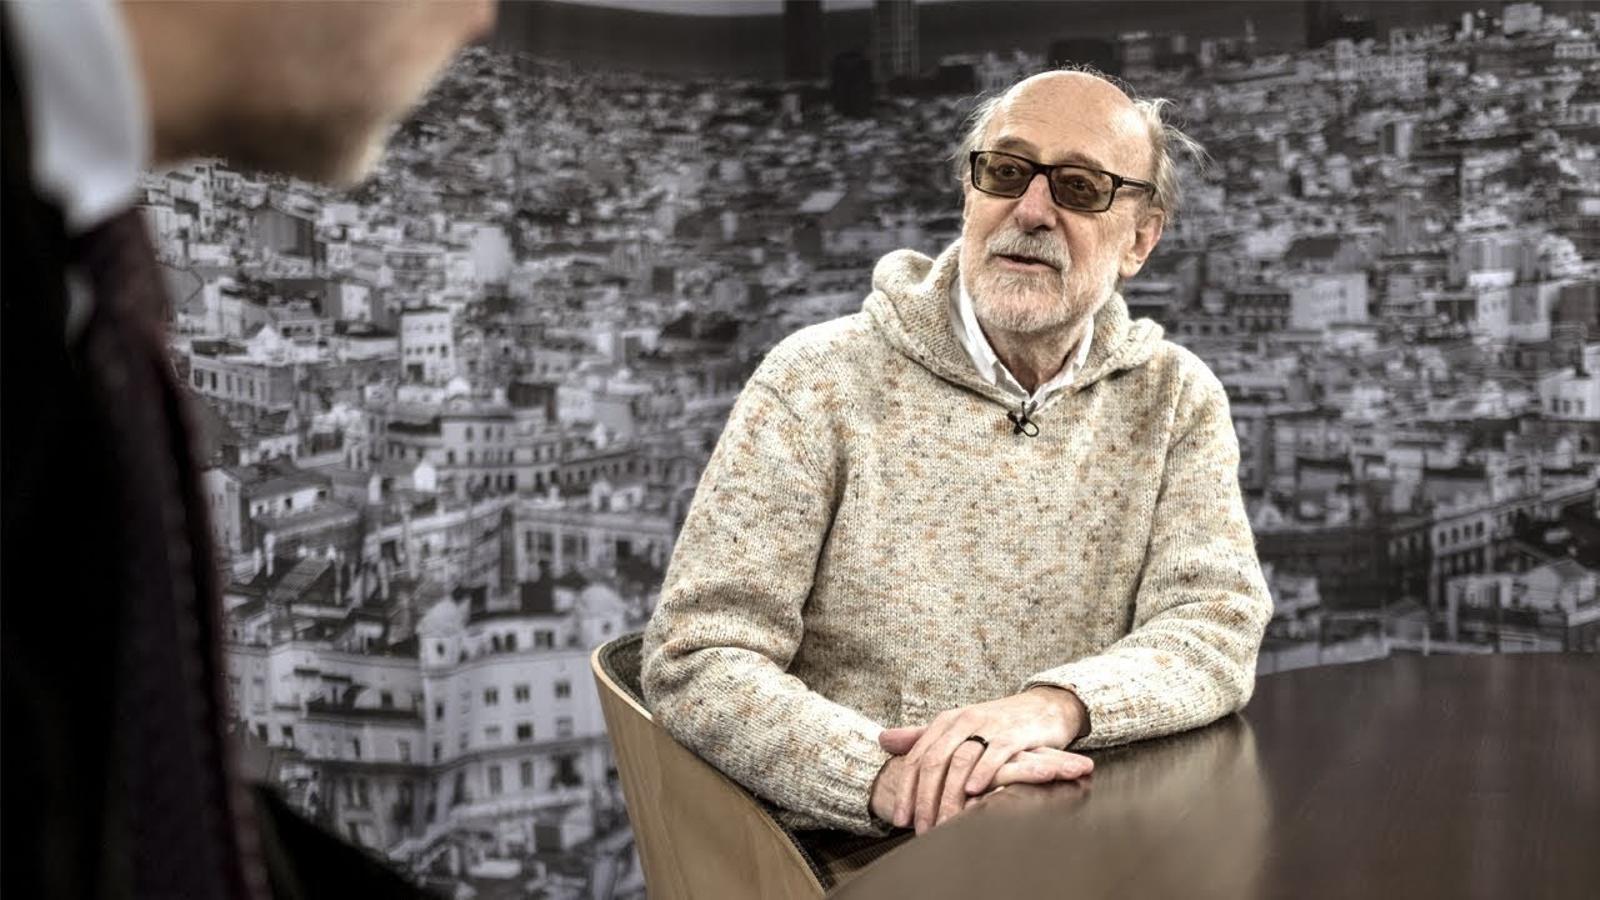 Entrevista d'Antoni Bassas a Joan Soler